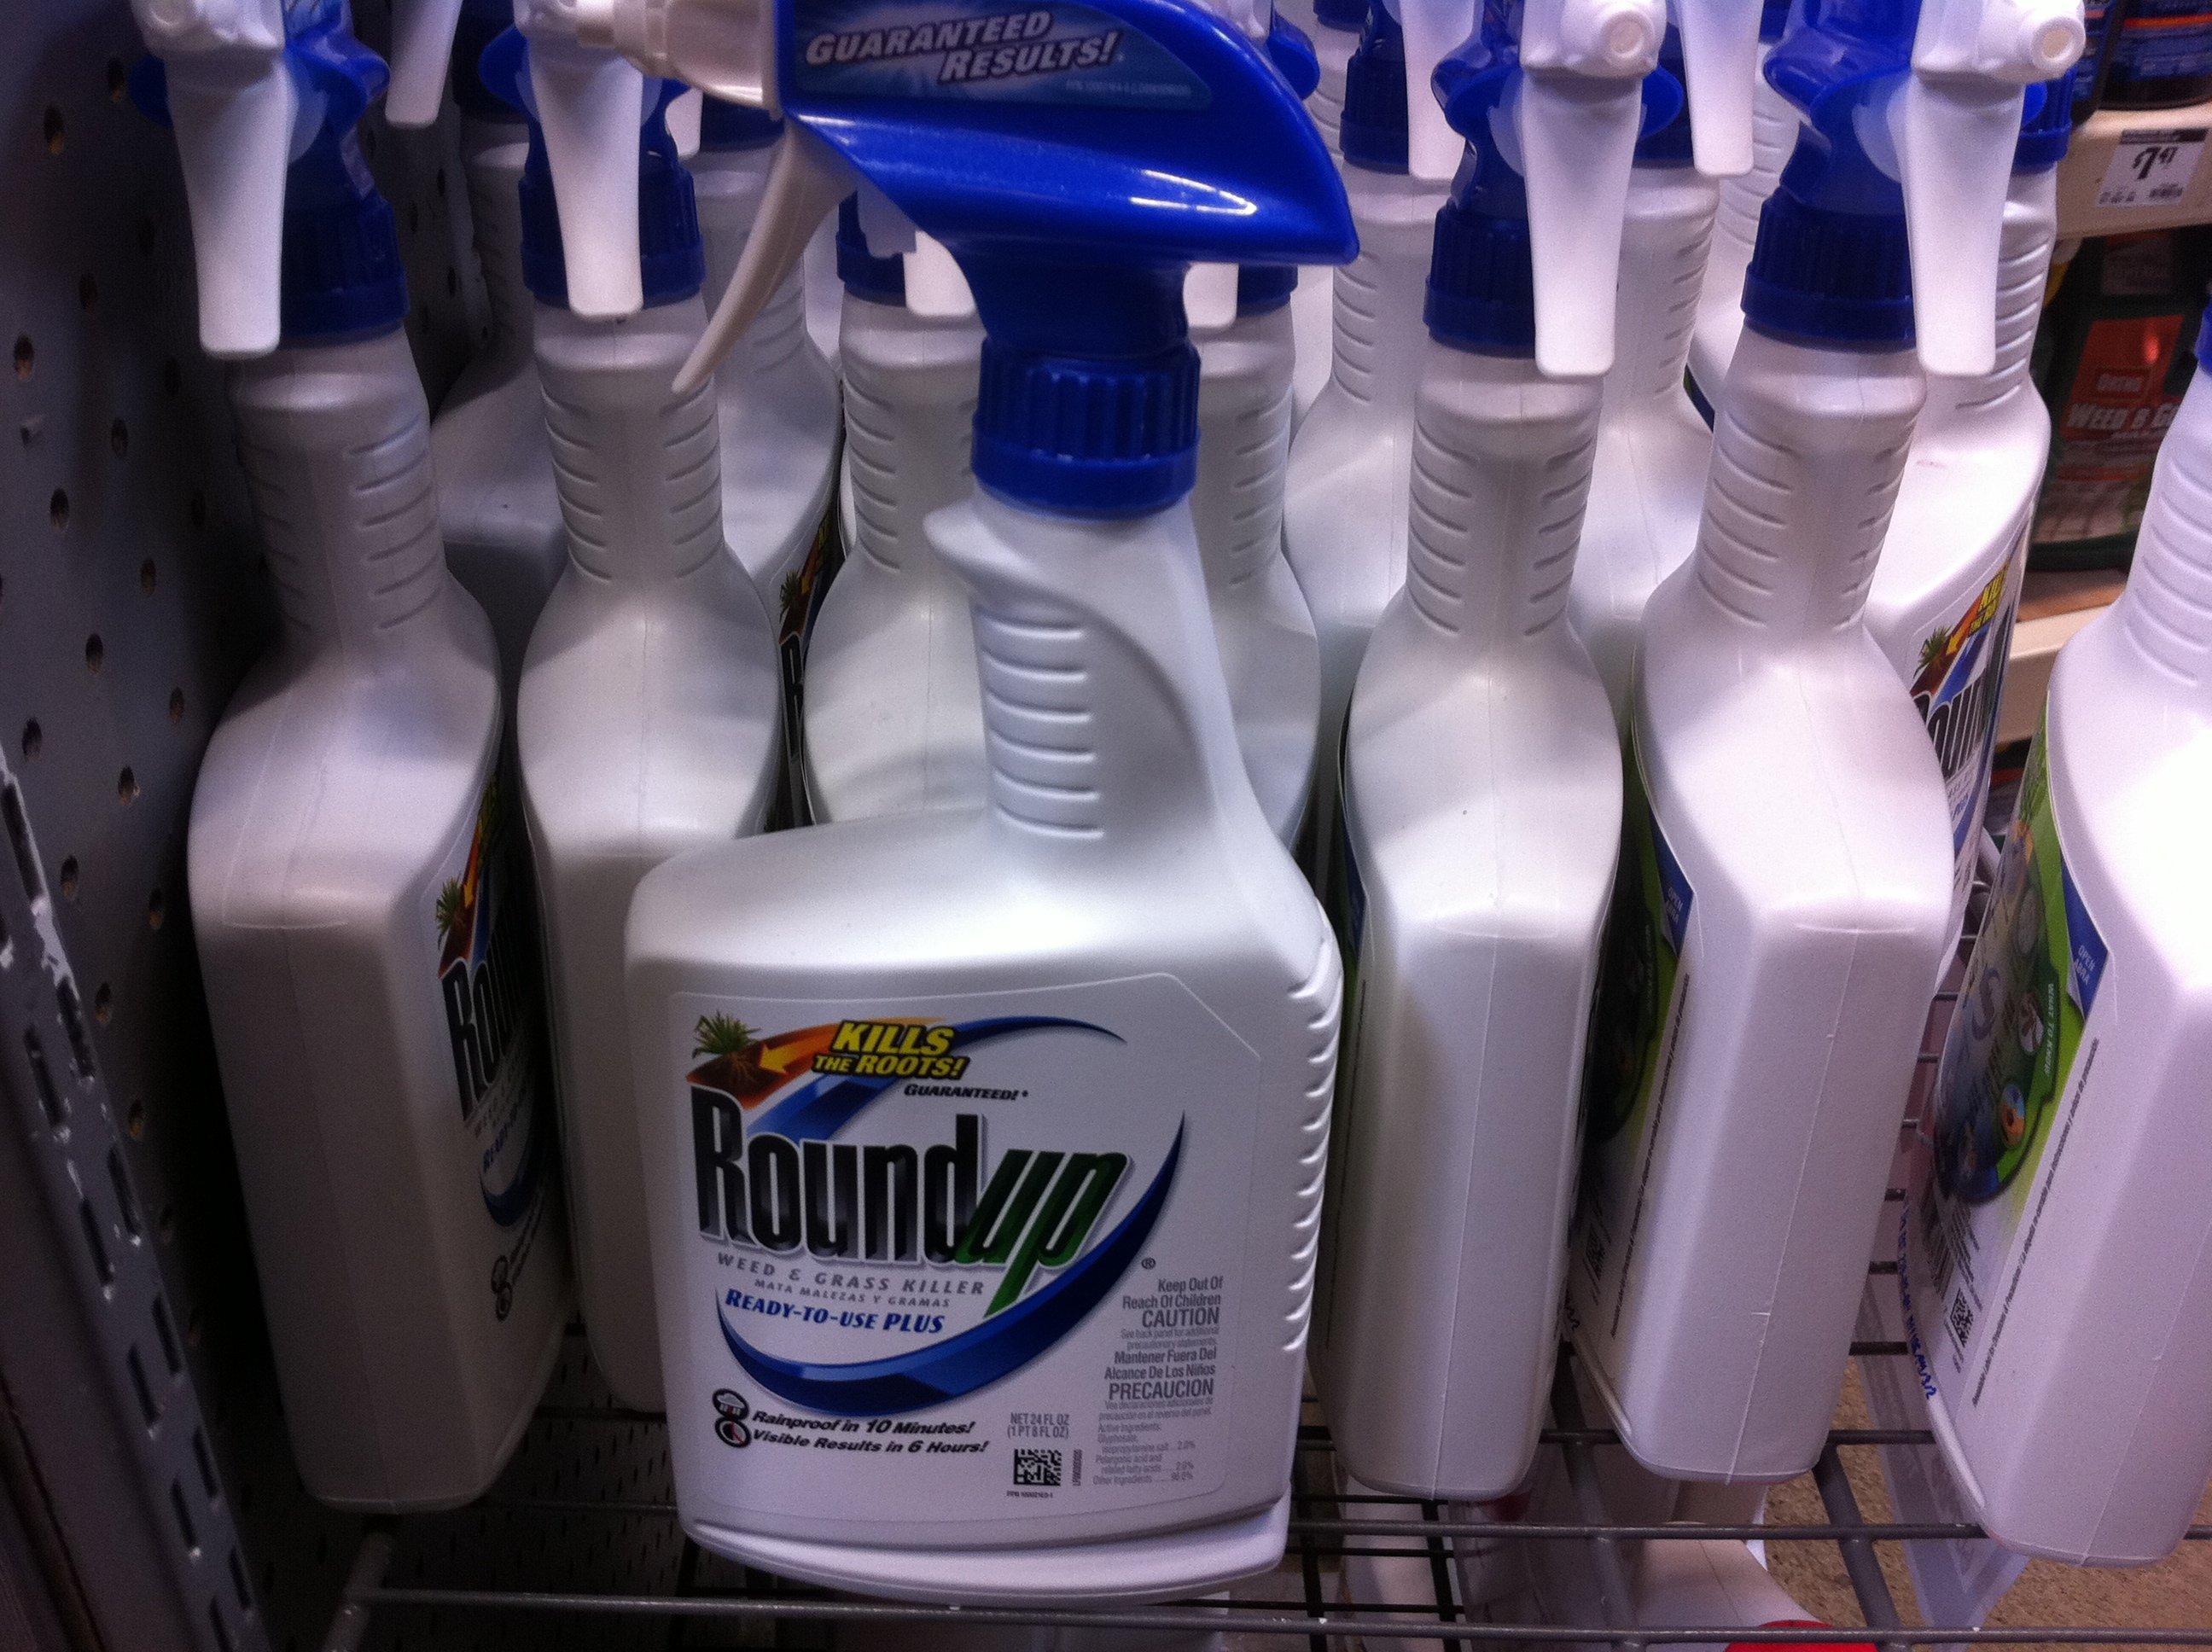 Sri Lanka's President Bans Monsanto Roundup and all Glyphosate Products